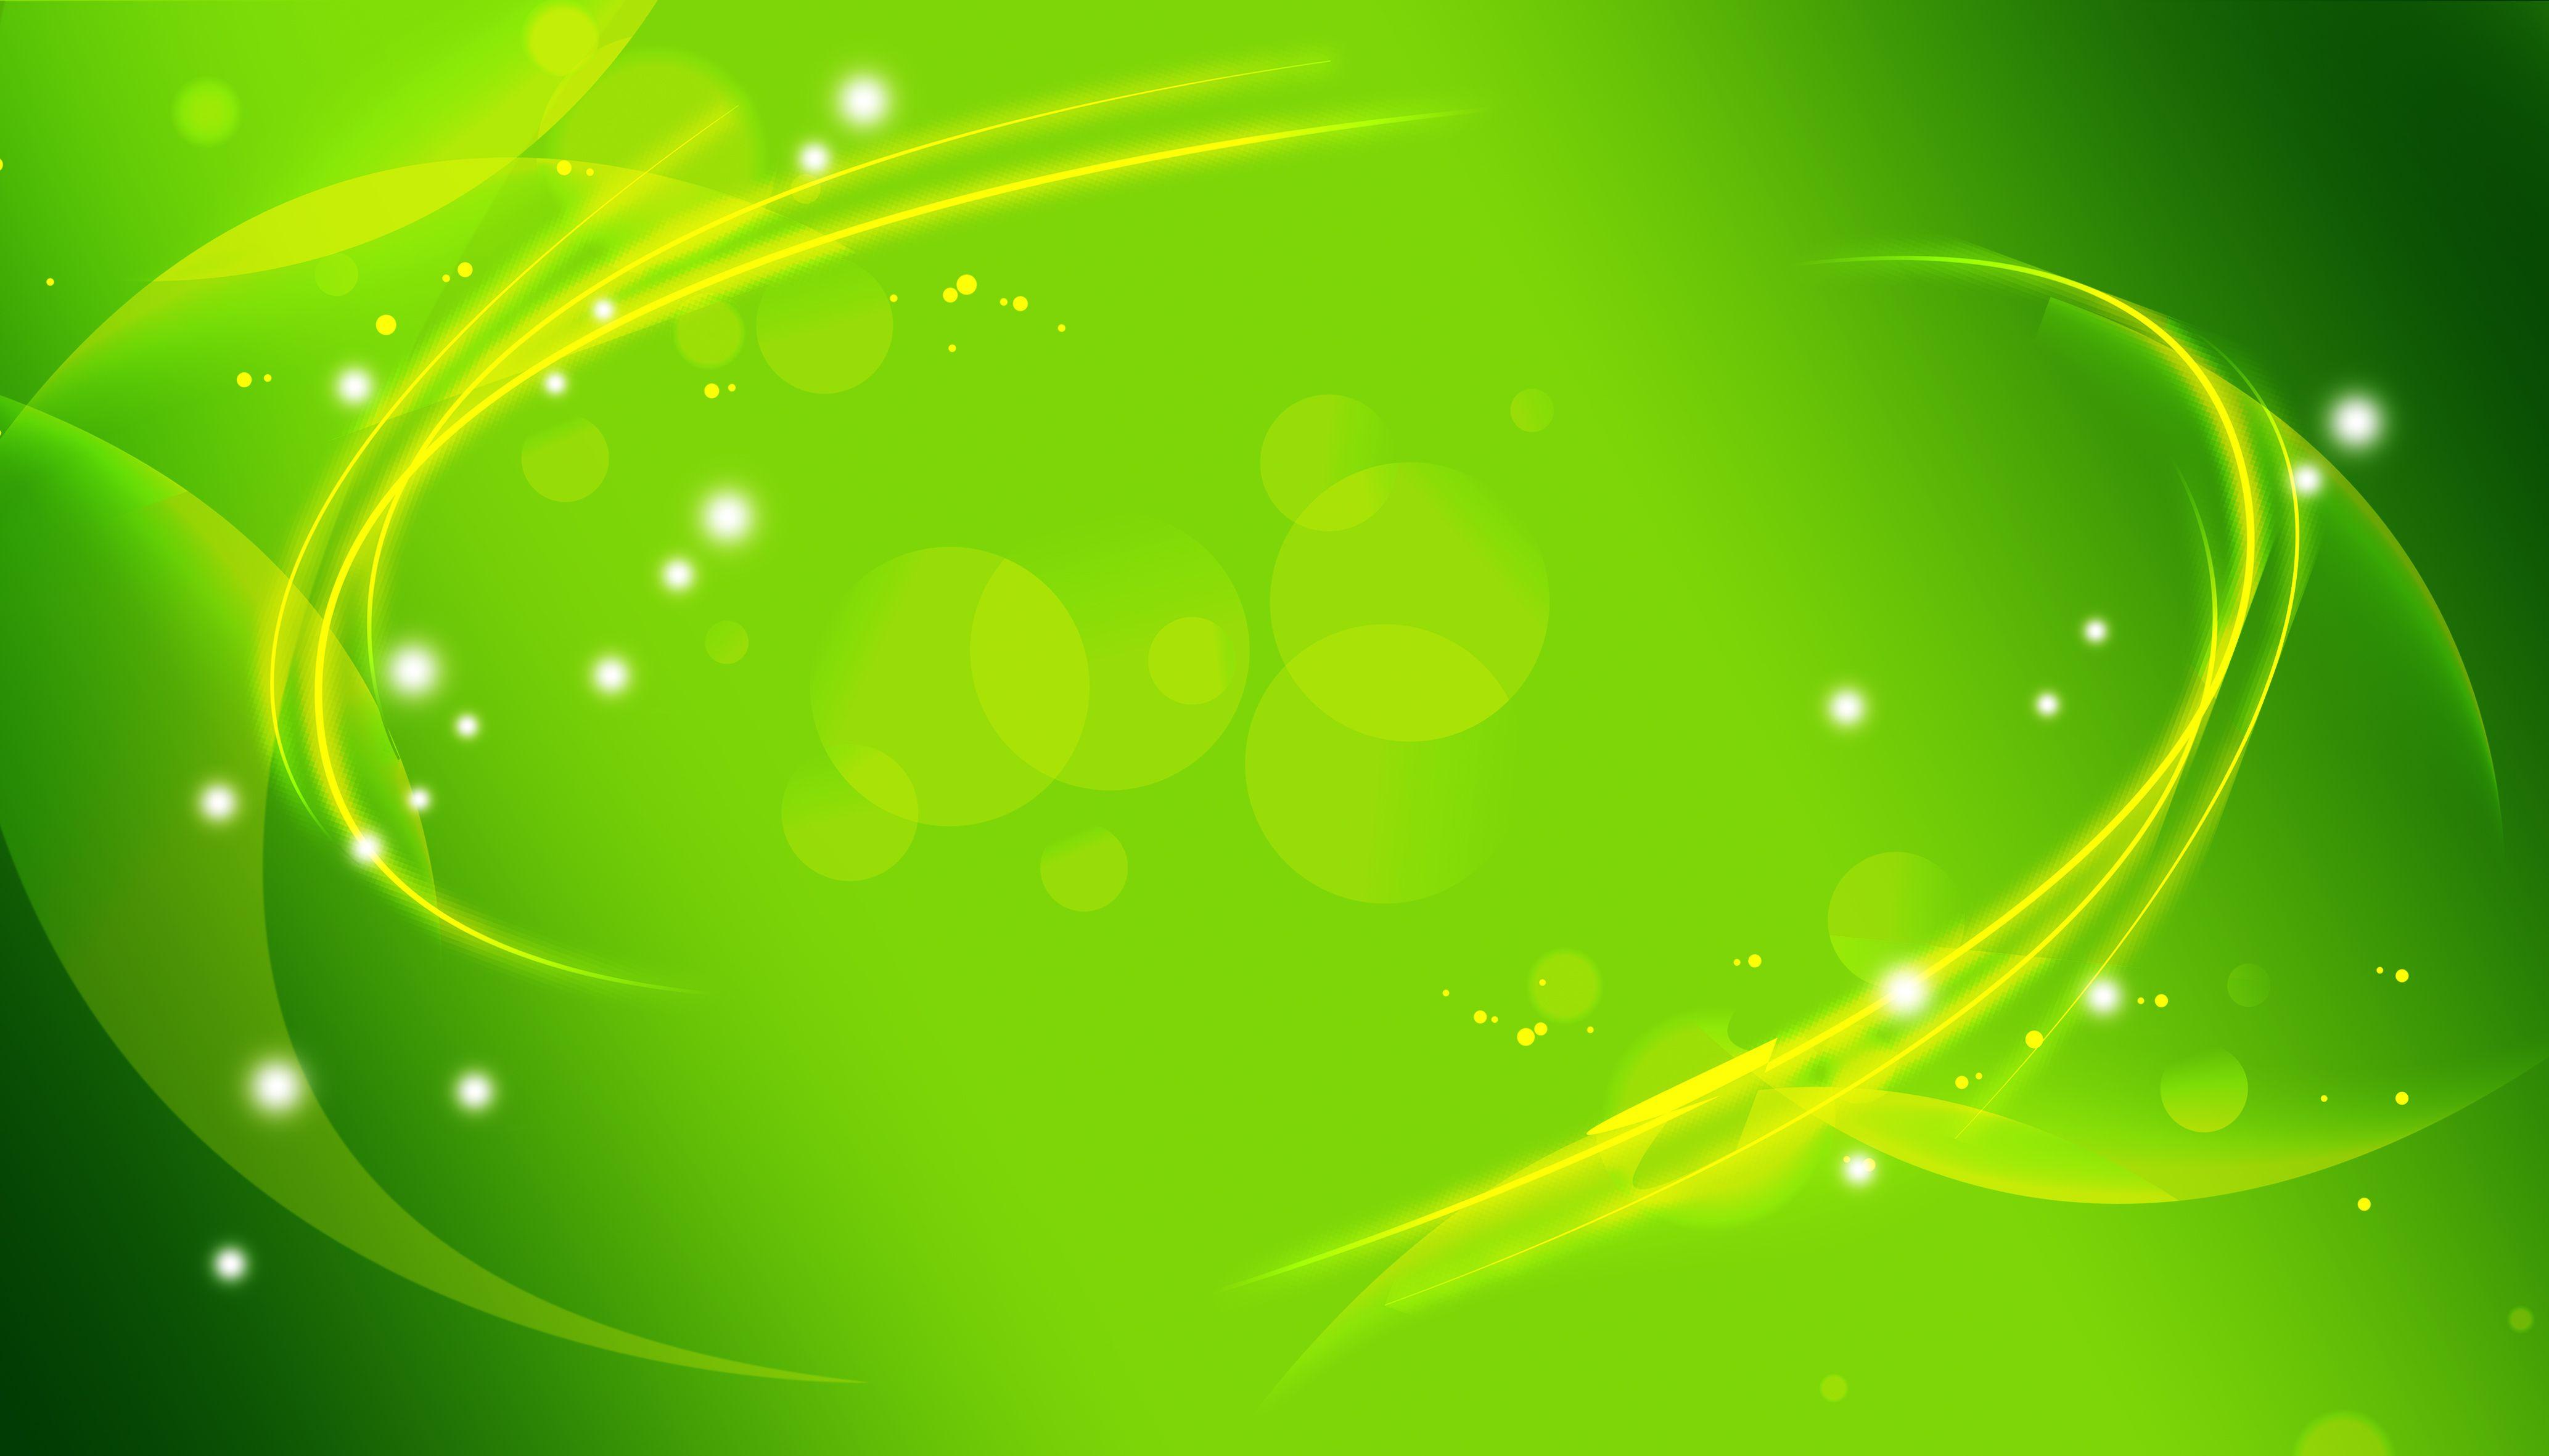 Fresh Light Green Background Star Poster in 2020 Green